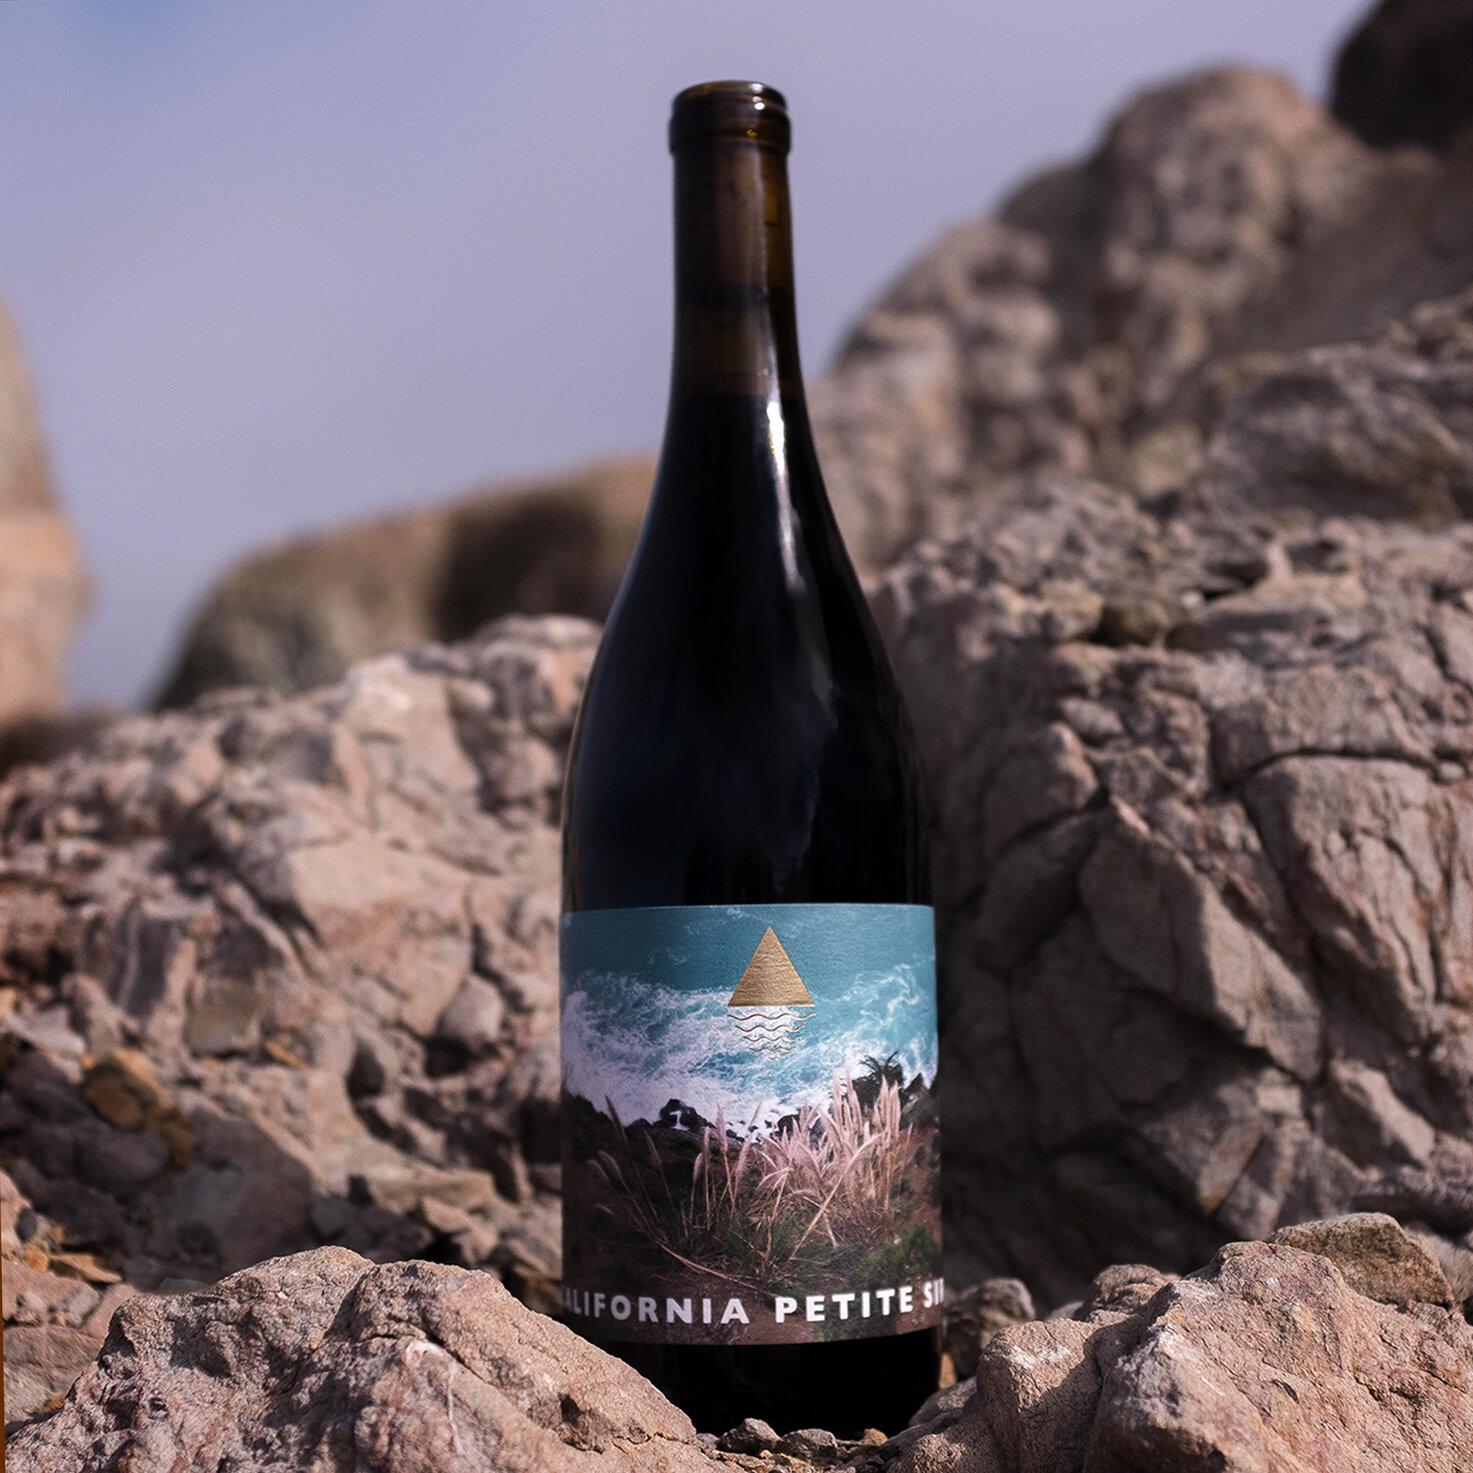 mountain-tides-wine-co-petite-sirah-california-2018-new-california-wine.jpg